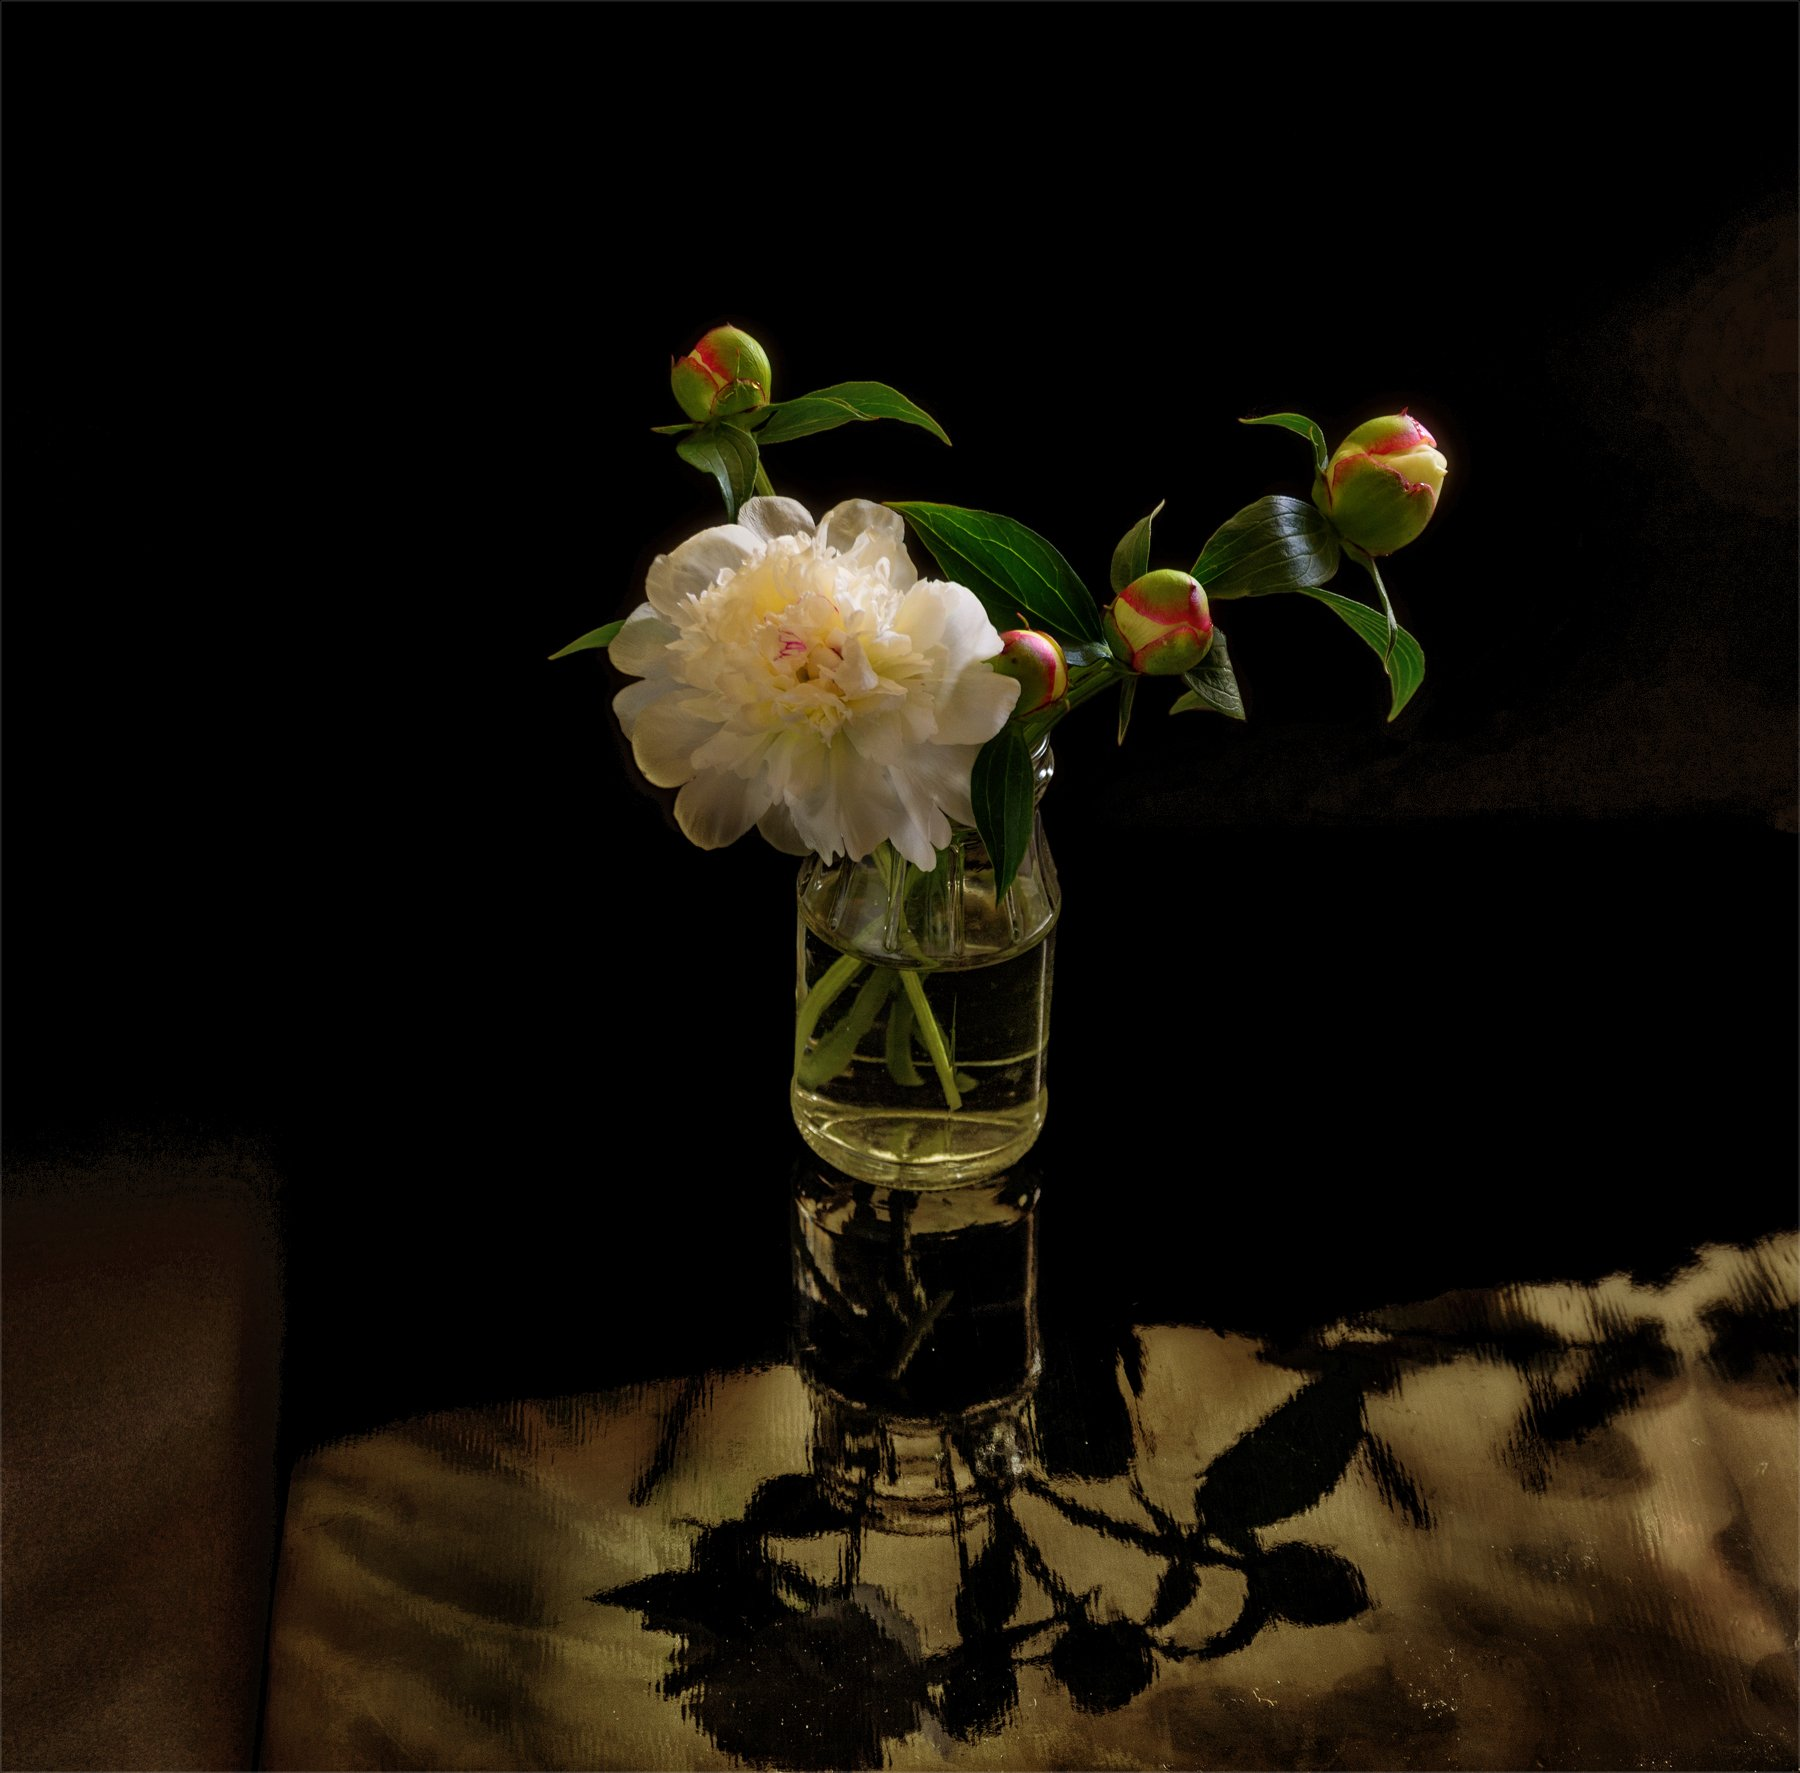 still life, натюрморт,  цветы, природа,  винтаж, пионы, минимализм, Михаил MSH